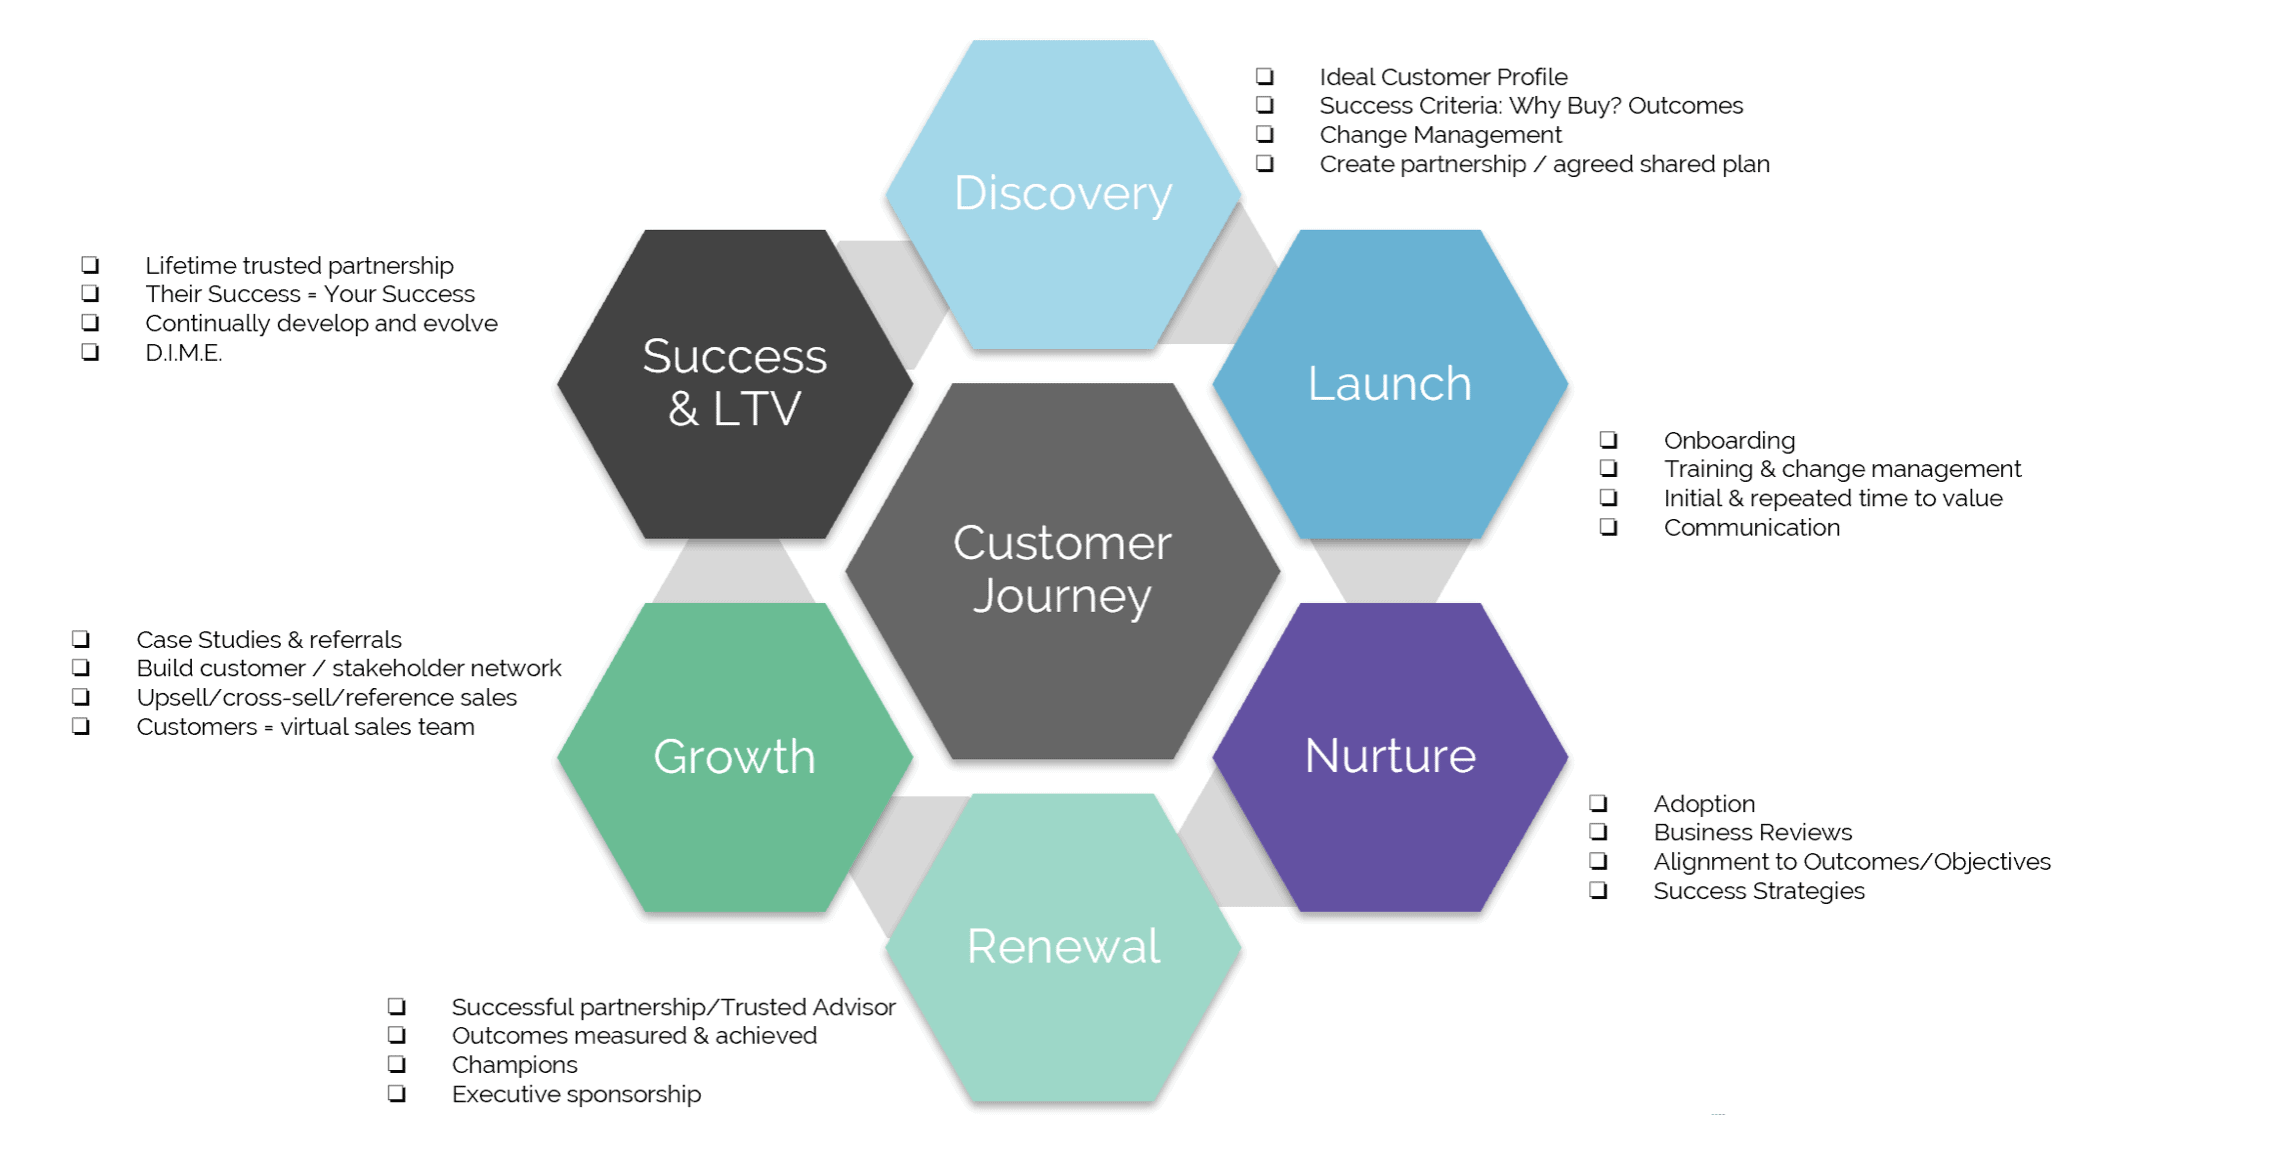 Customer Success in the Customer Journey